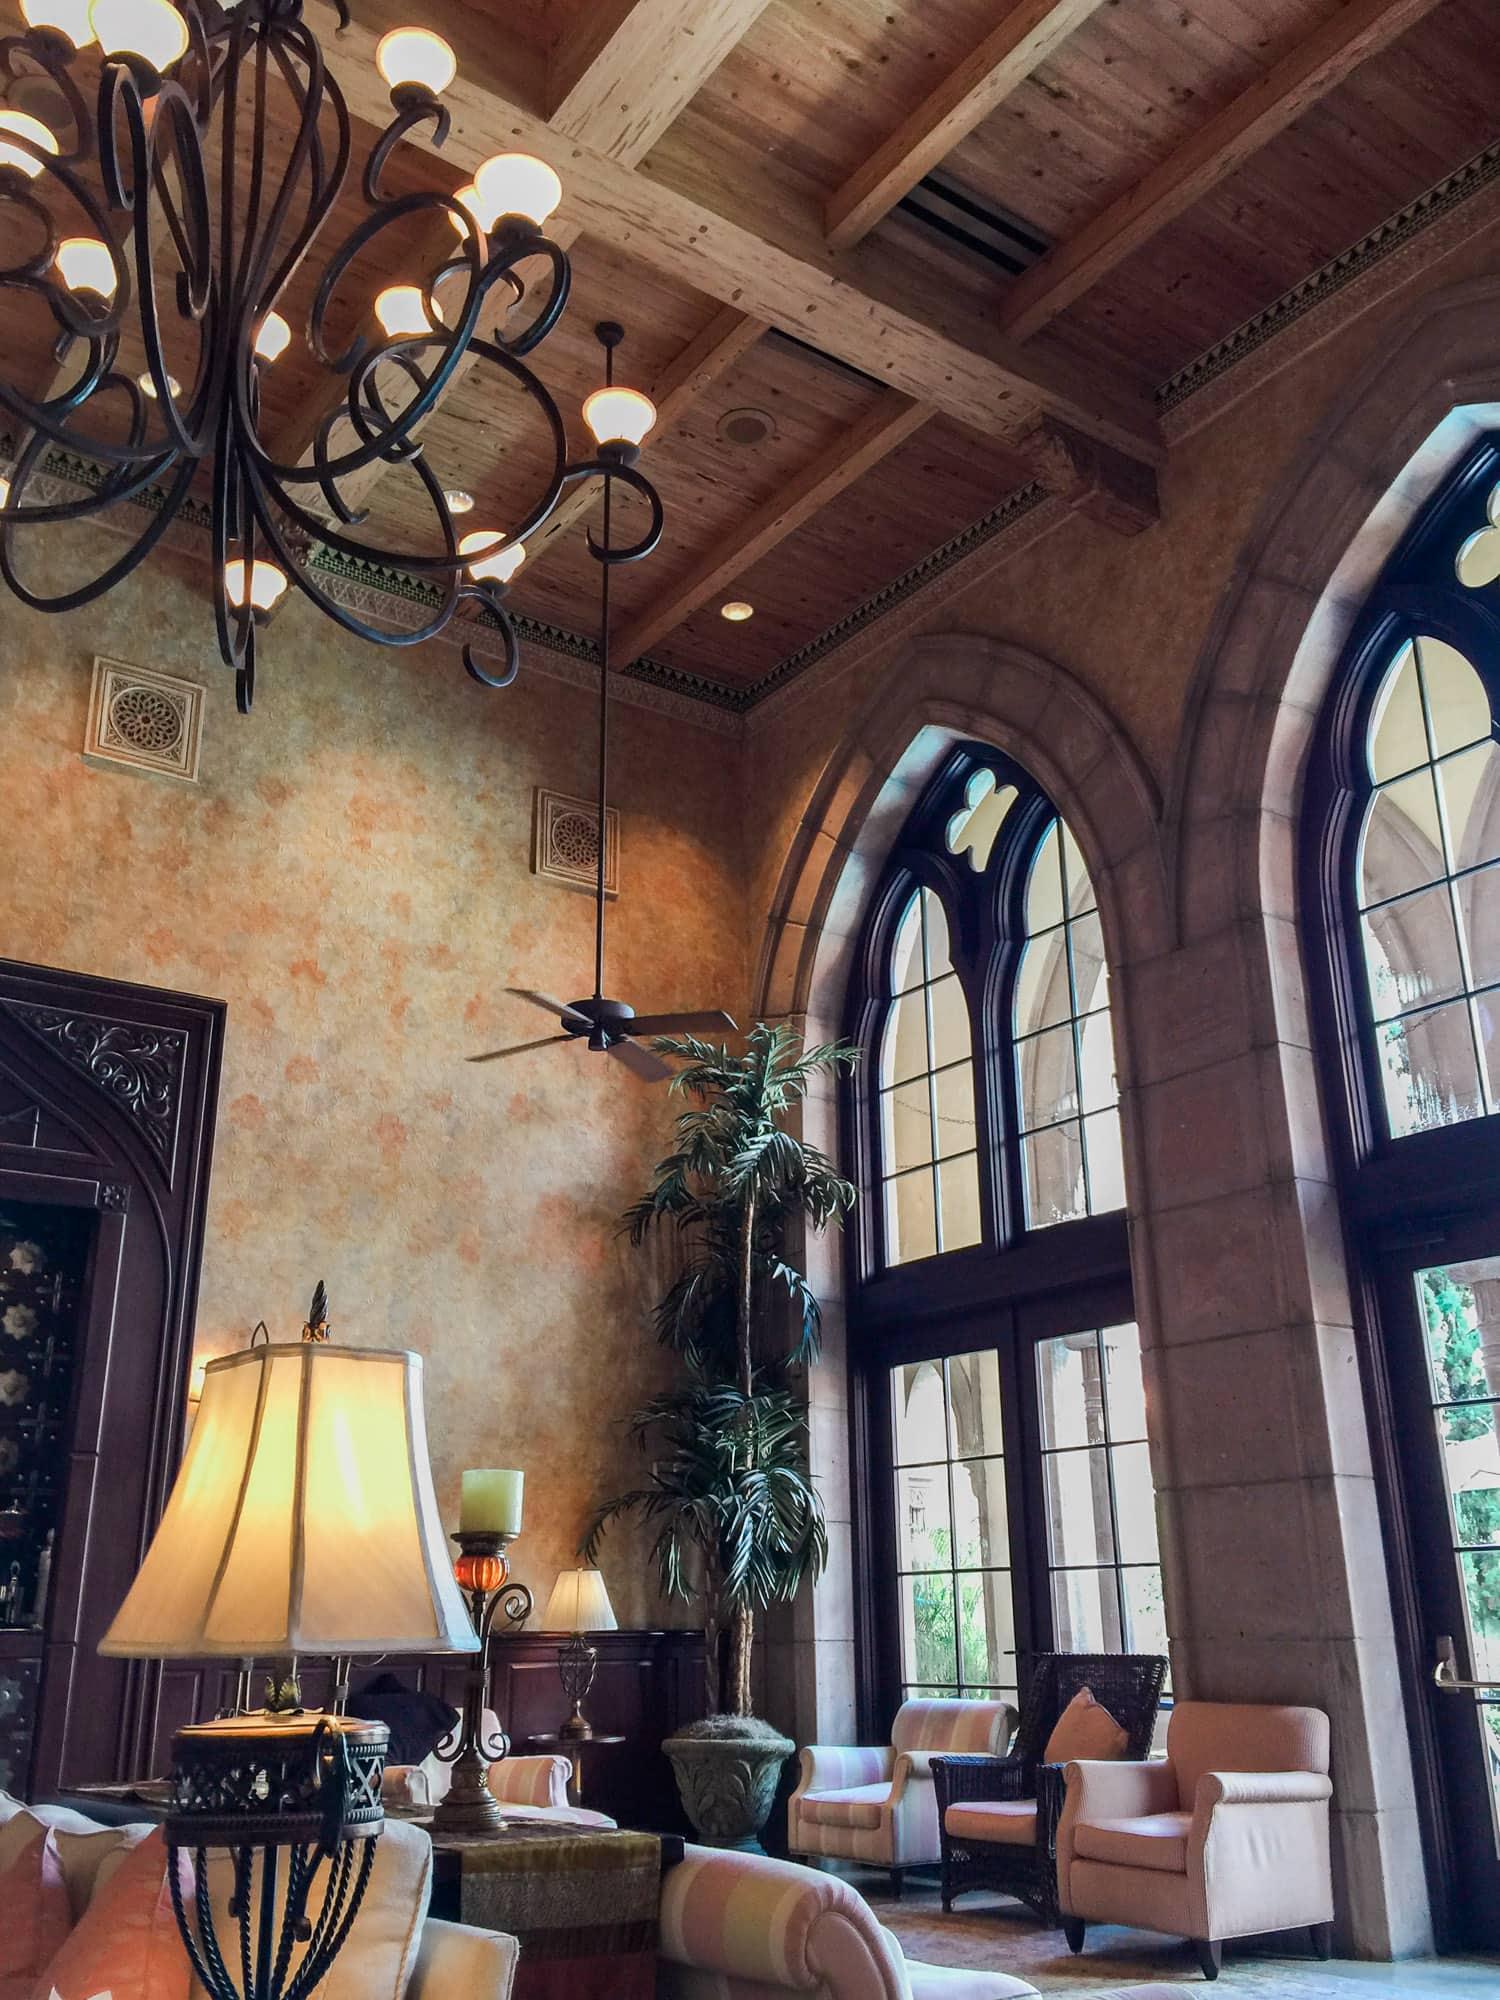 Waldorf Astoria Spa at the Boca Raton Resort + A full review of the Boca Raton Resort & Club by blogger Ashley Brooke Nicholas